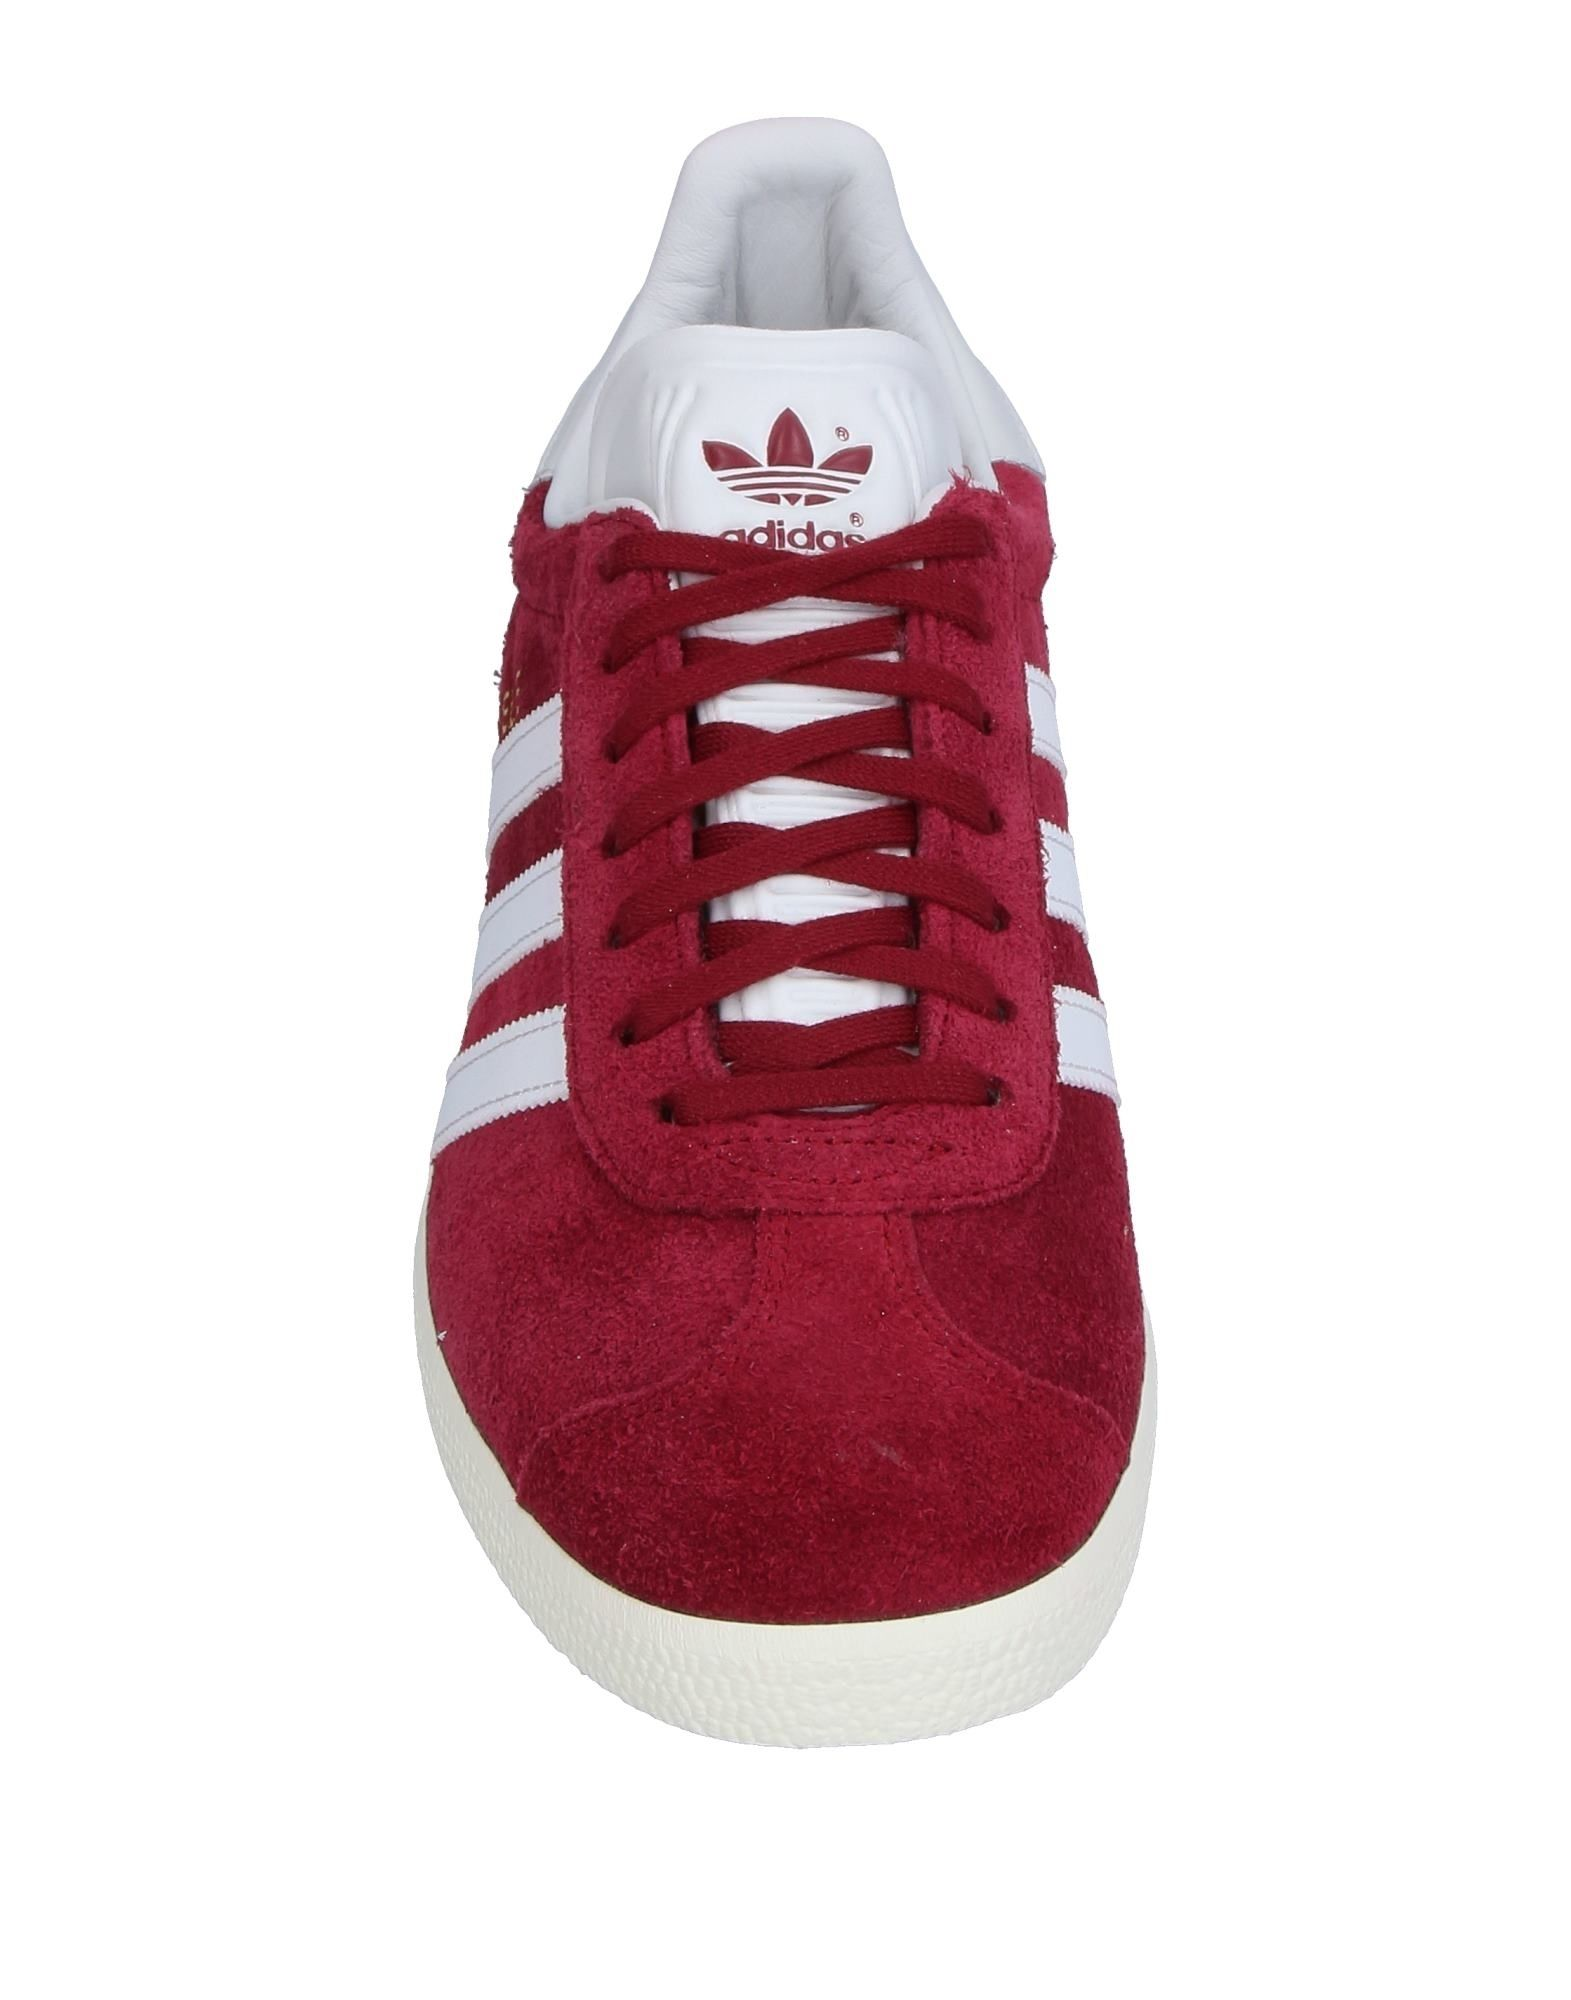 Adidas Originals Sneakers Sneakers Originals Herren Gutes Preis-Leistungs-Verhältnis, es lohnt sich 051605